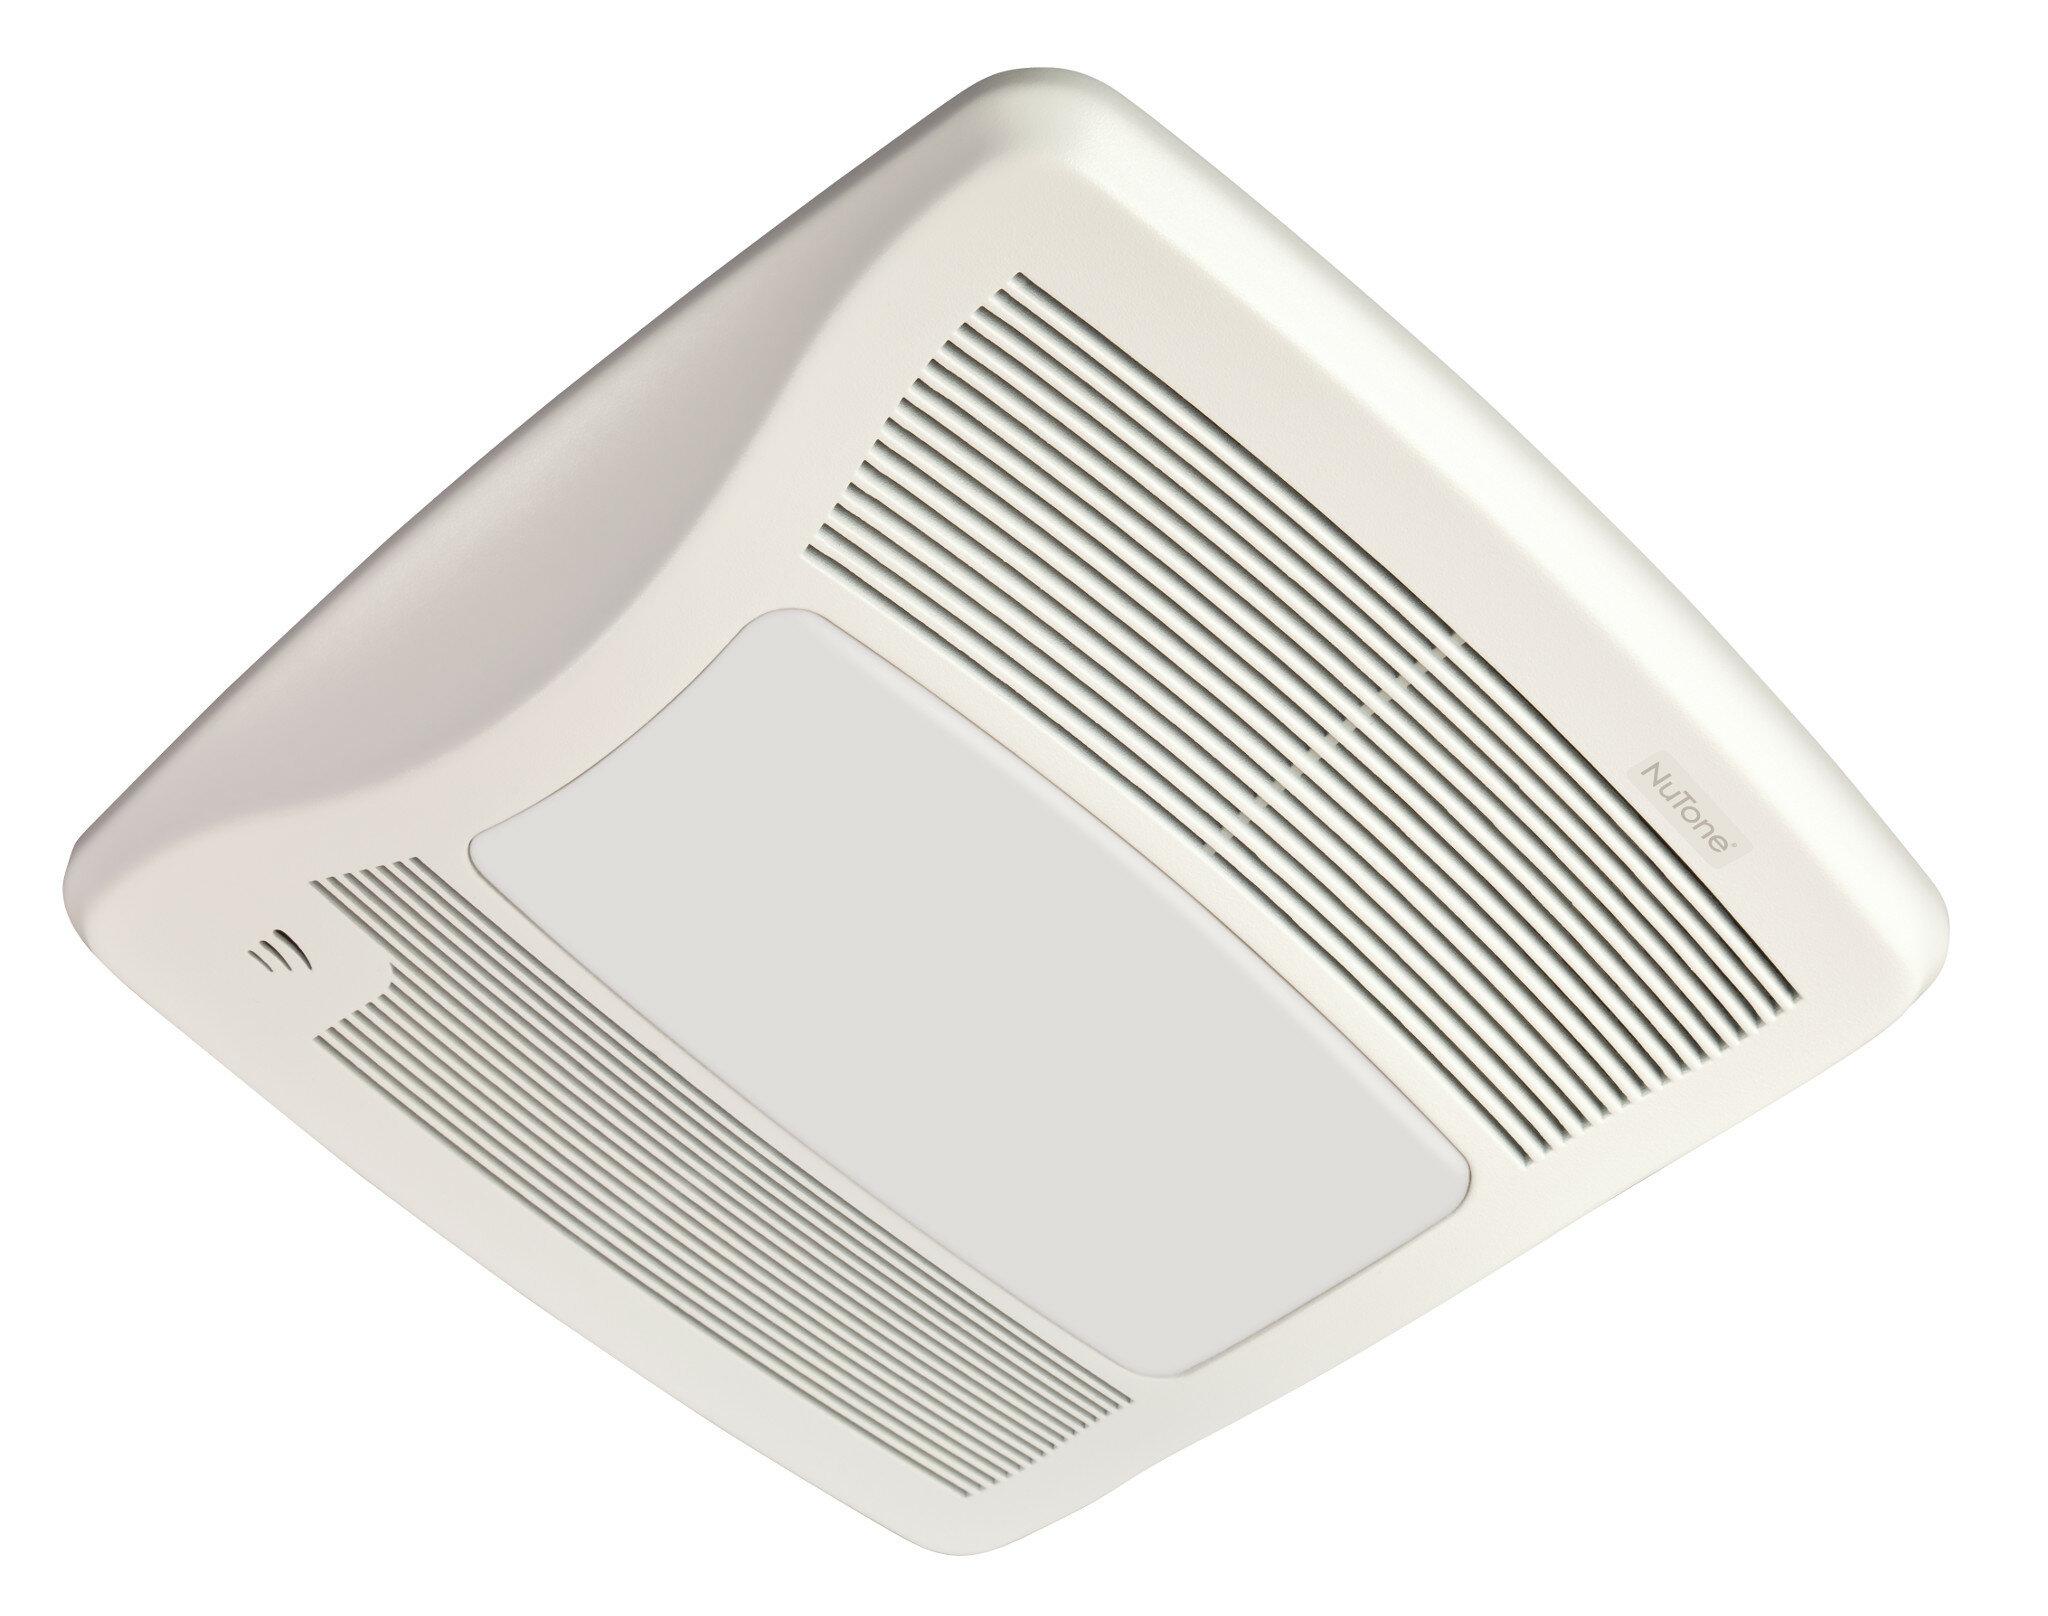 Nutone Ultra Silent Series Fan Whtie Grille 150 CFM Energy Star